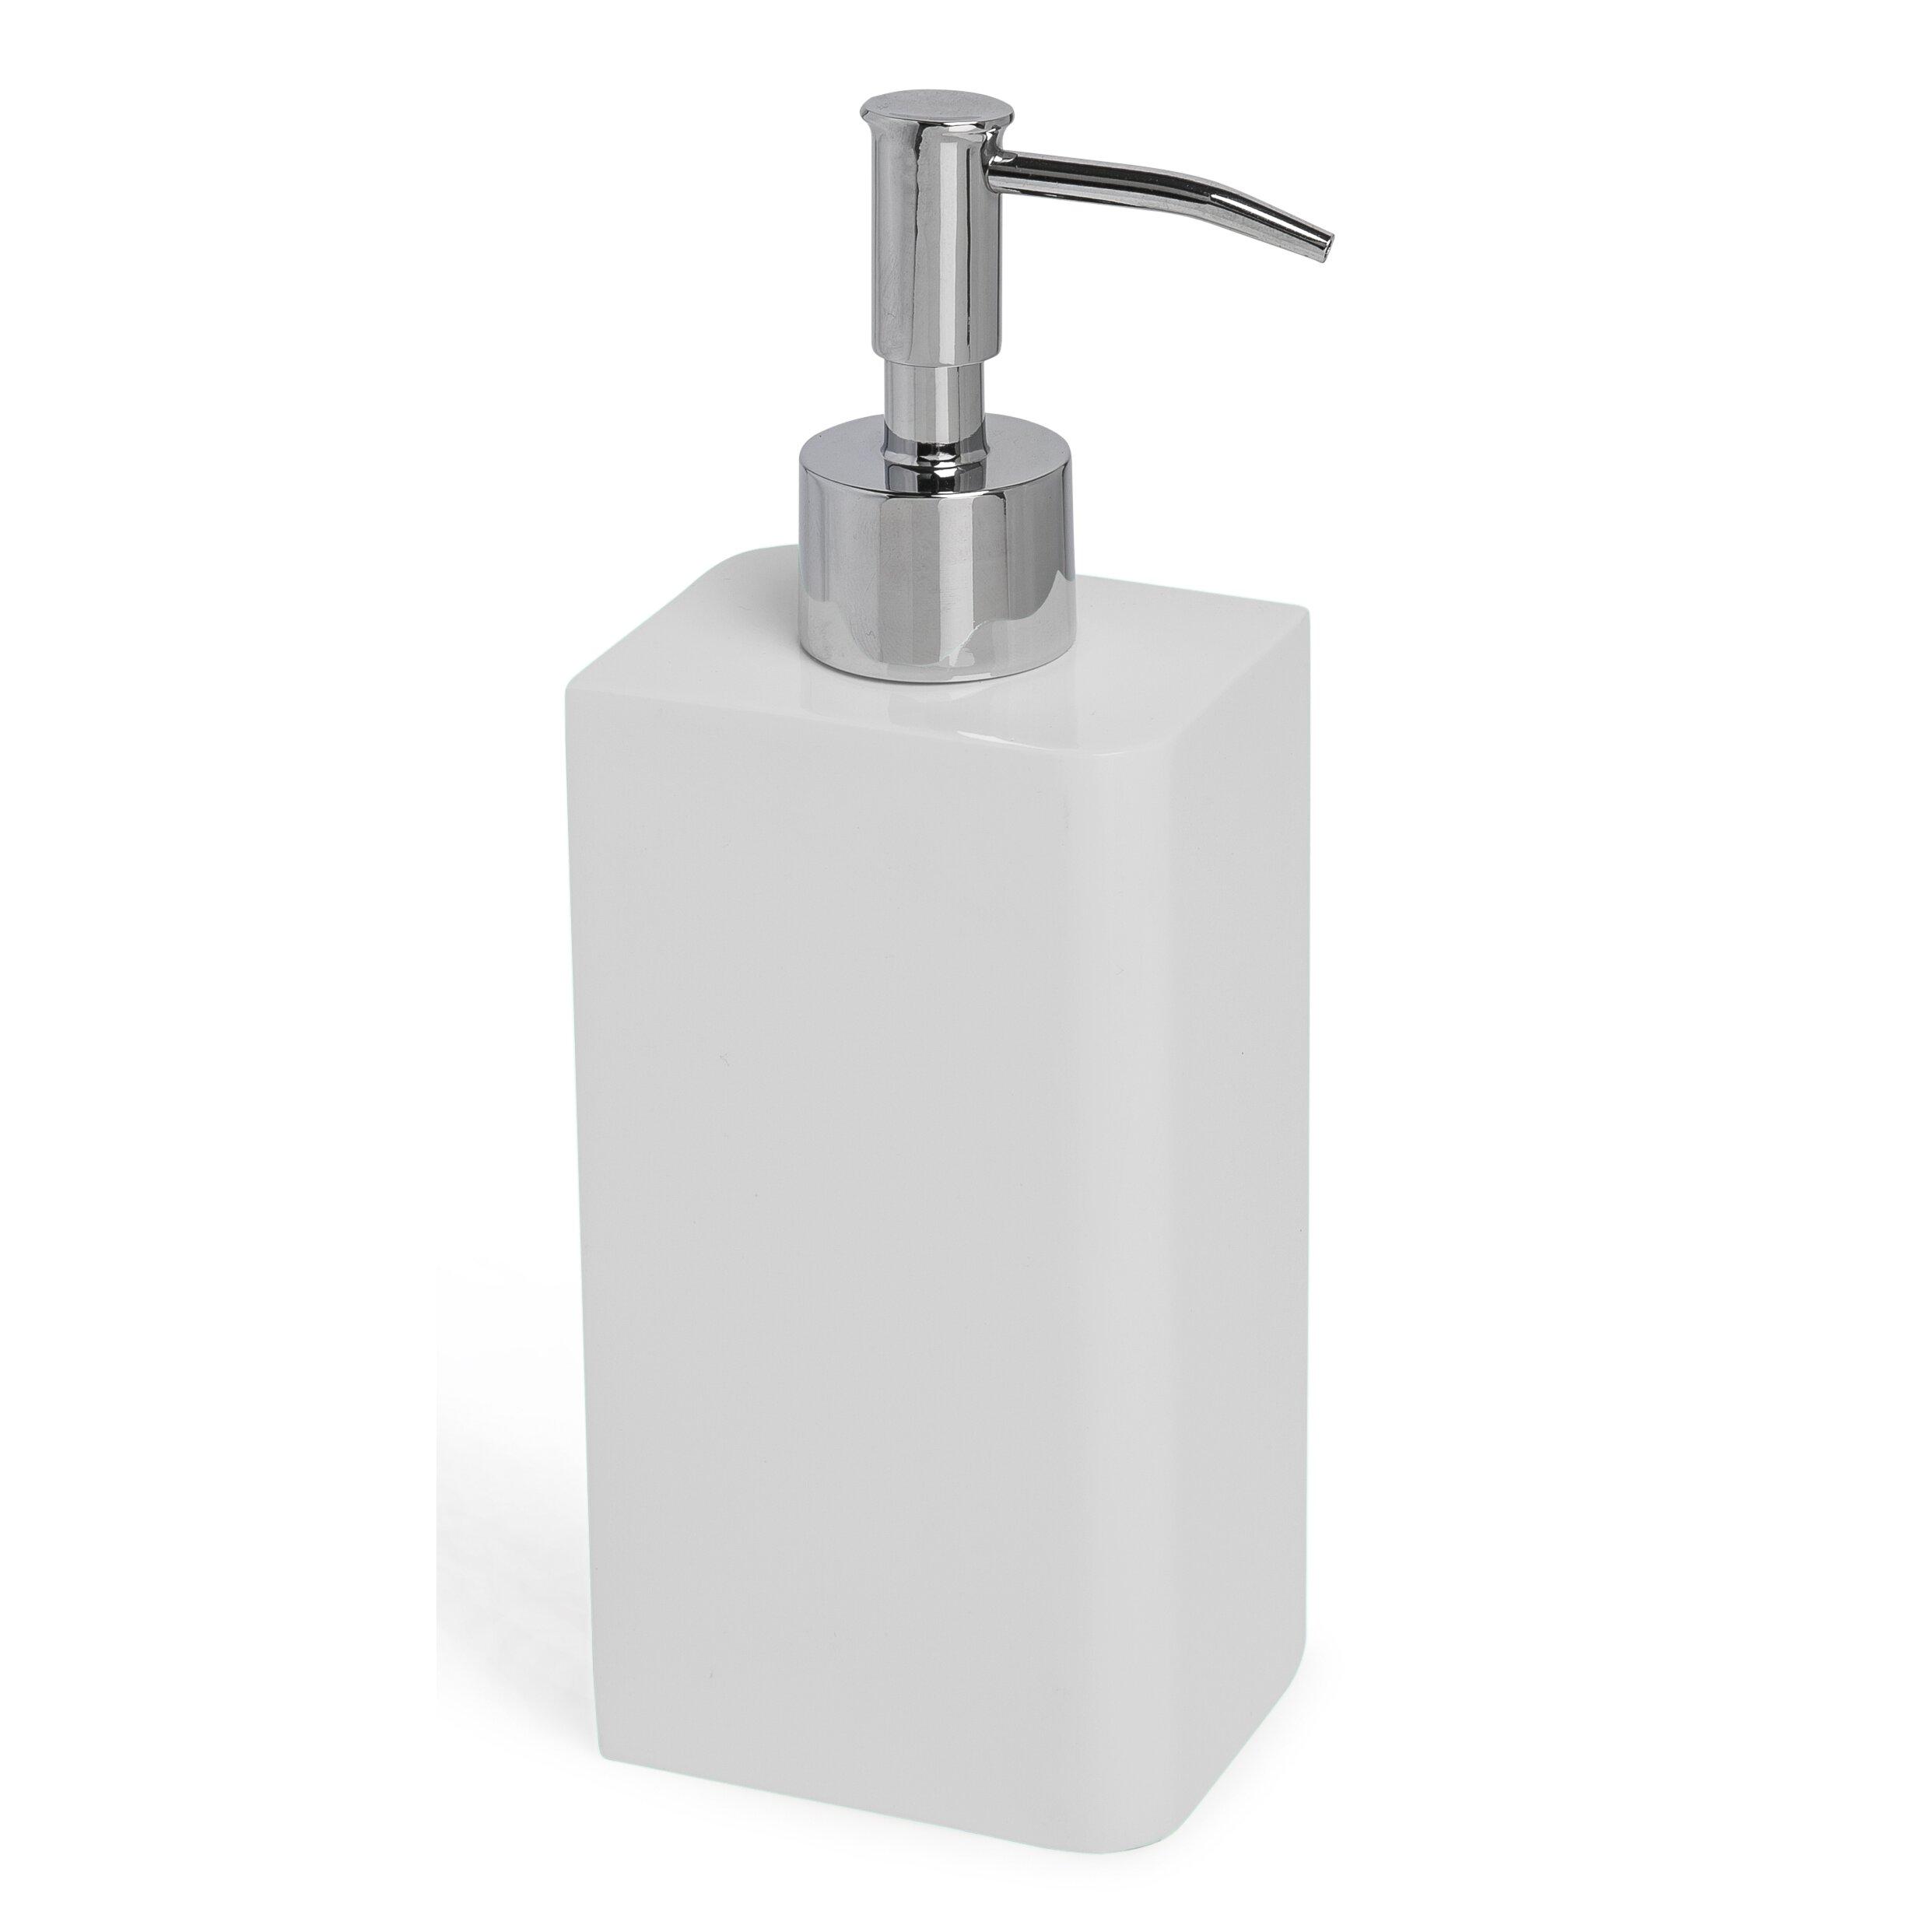 Wayfair Bathroom Accessories Kassatex Lacca Collection Bath Accessories Soap Lotion Dispenser